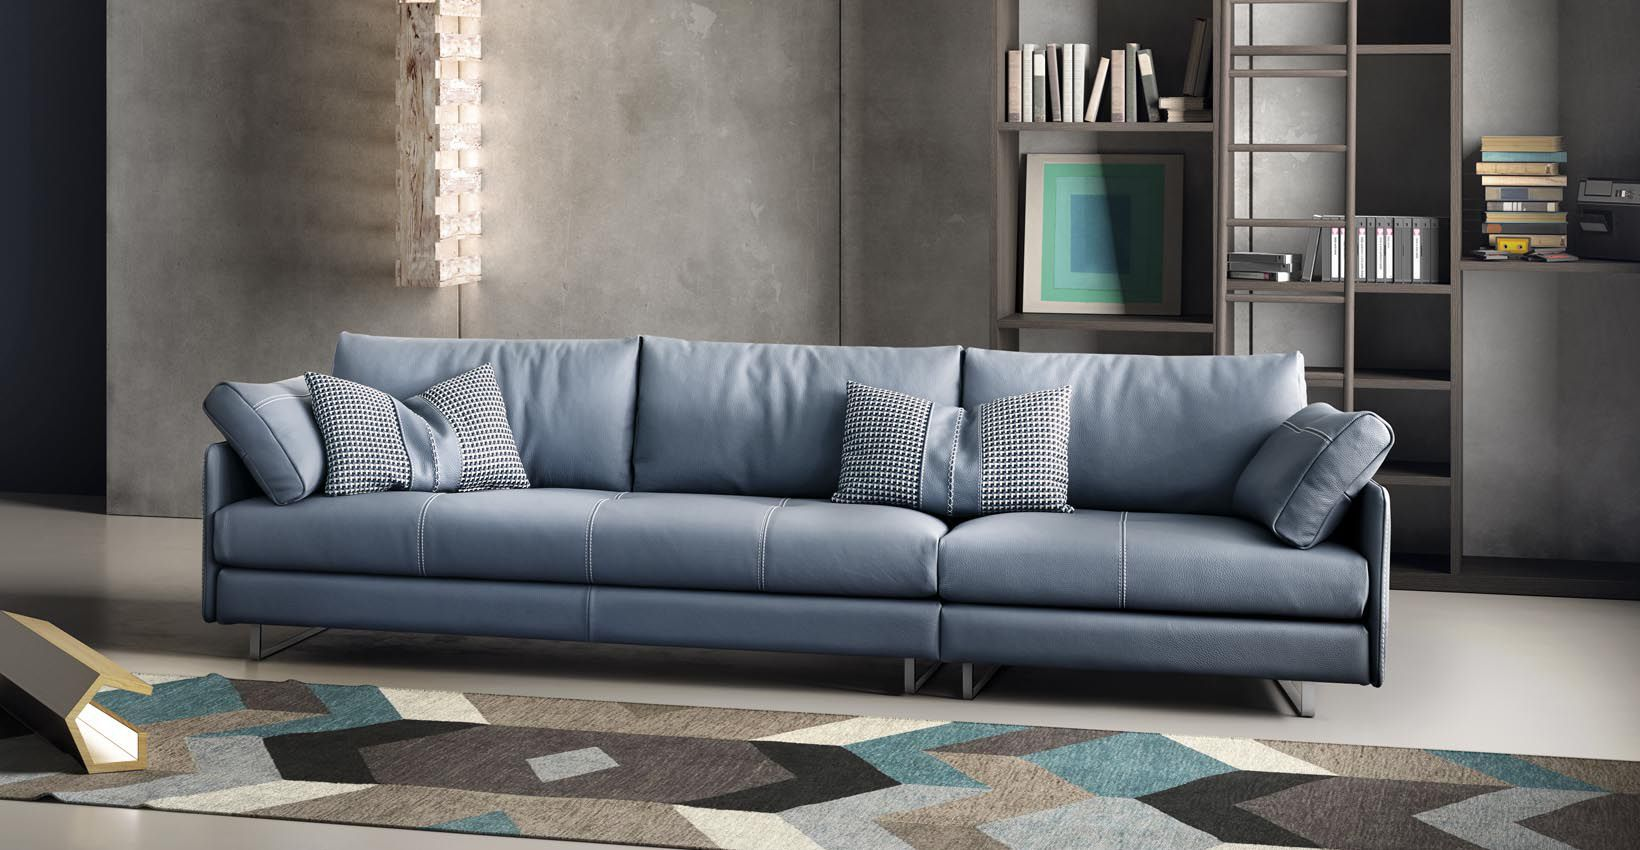 Modular Sofa Contemporary Leather 3 Seater Swing